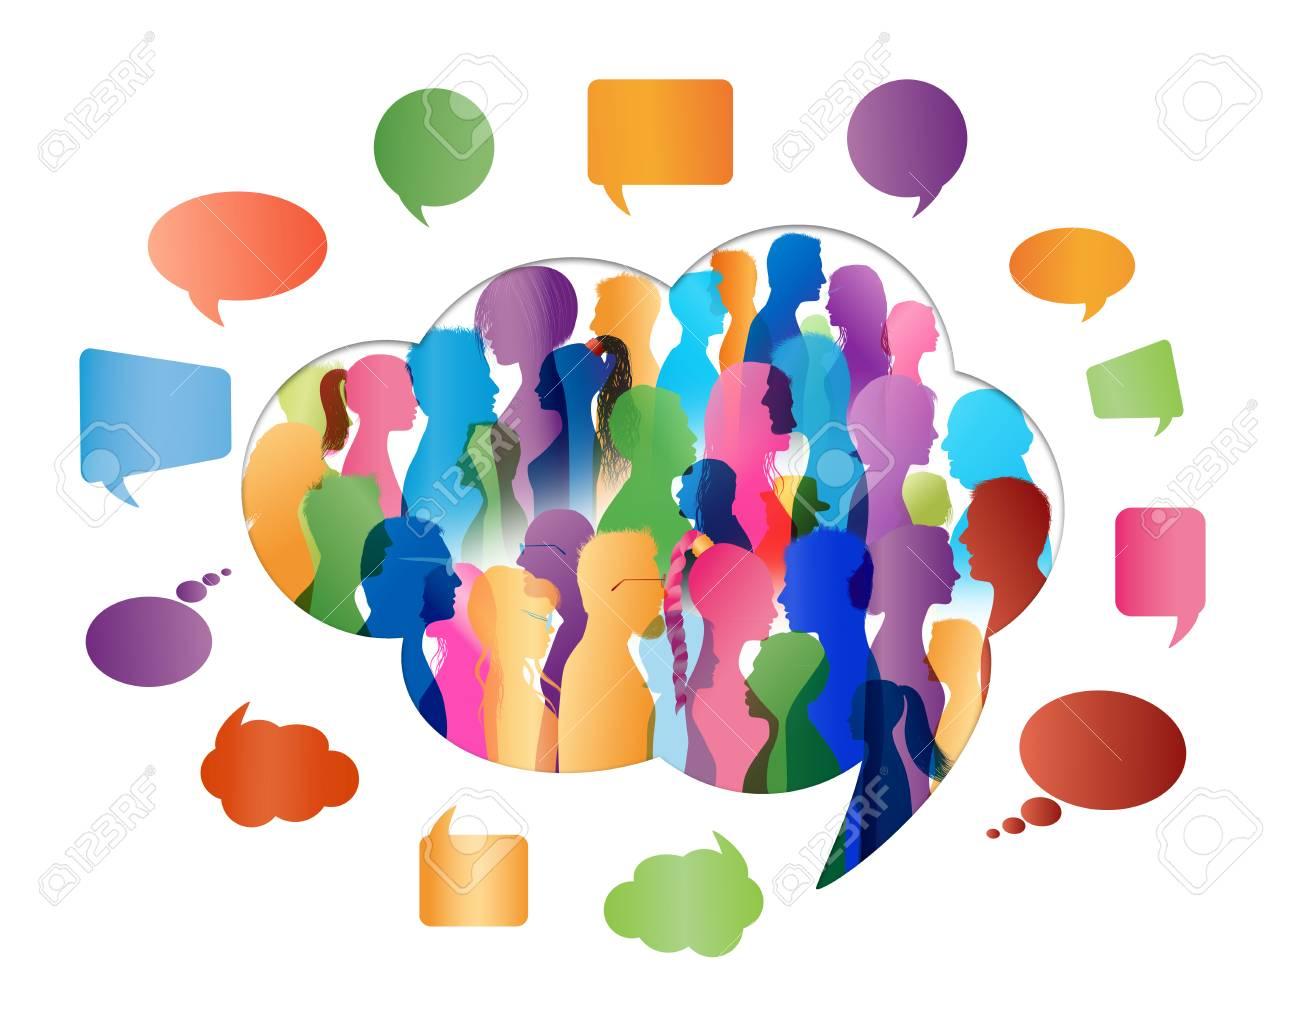 Crowd talking. Group of people talking. Speech bubble. Communication. Colored silhouette people profile in cloud shape - 113583432